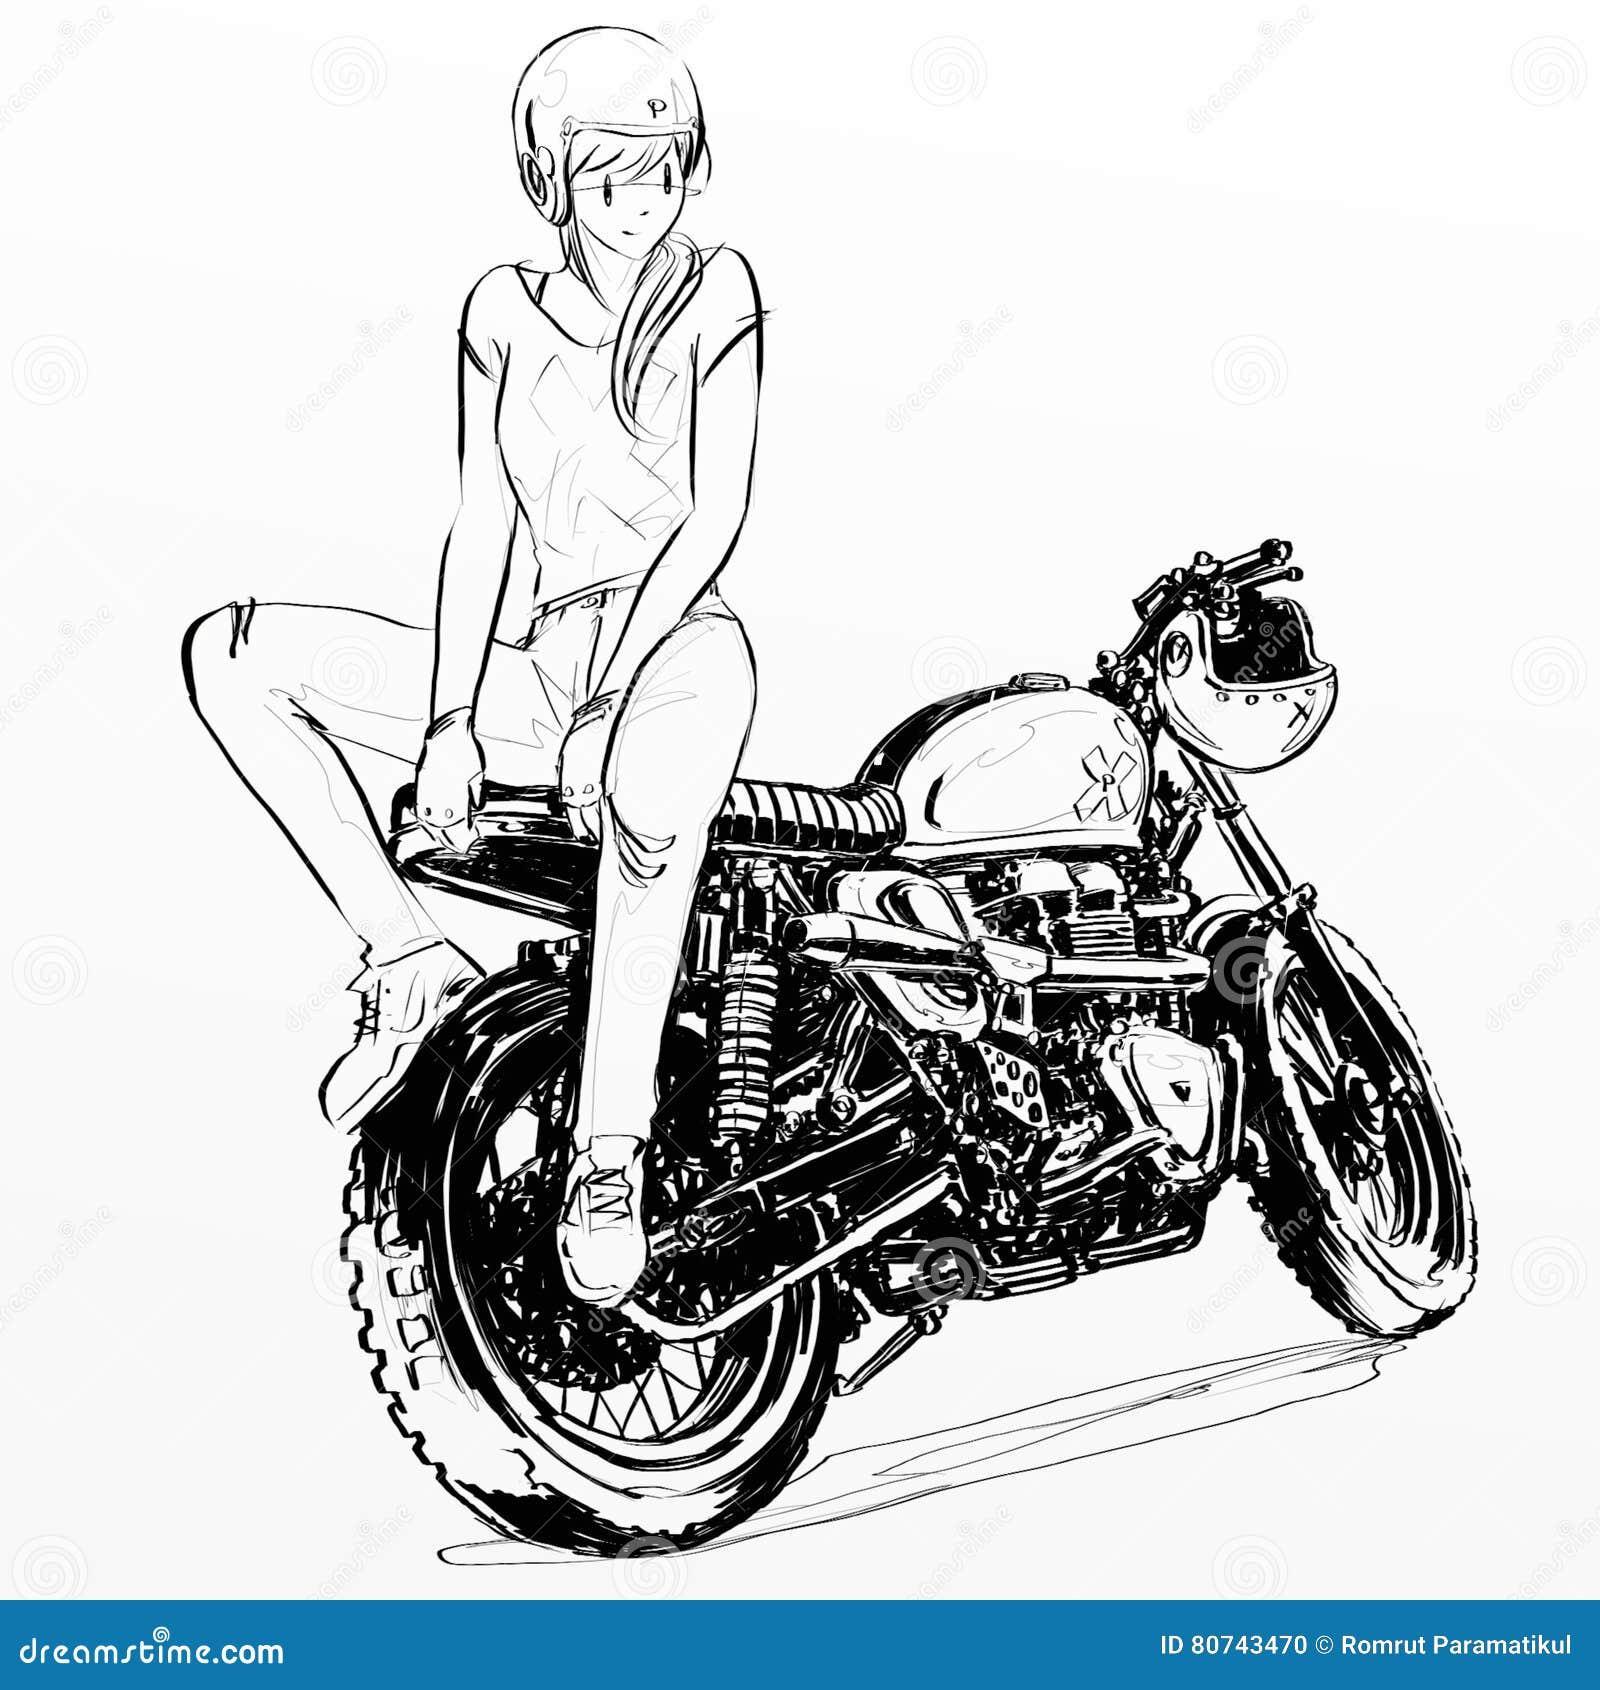 Pin up motorcycle line art jpg - Beautiful Cartoon Girl Illustration Motorcycle Pinup